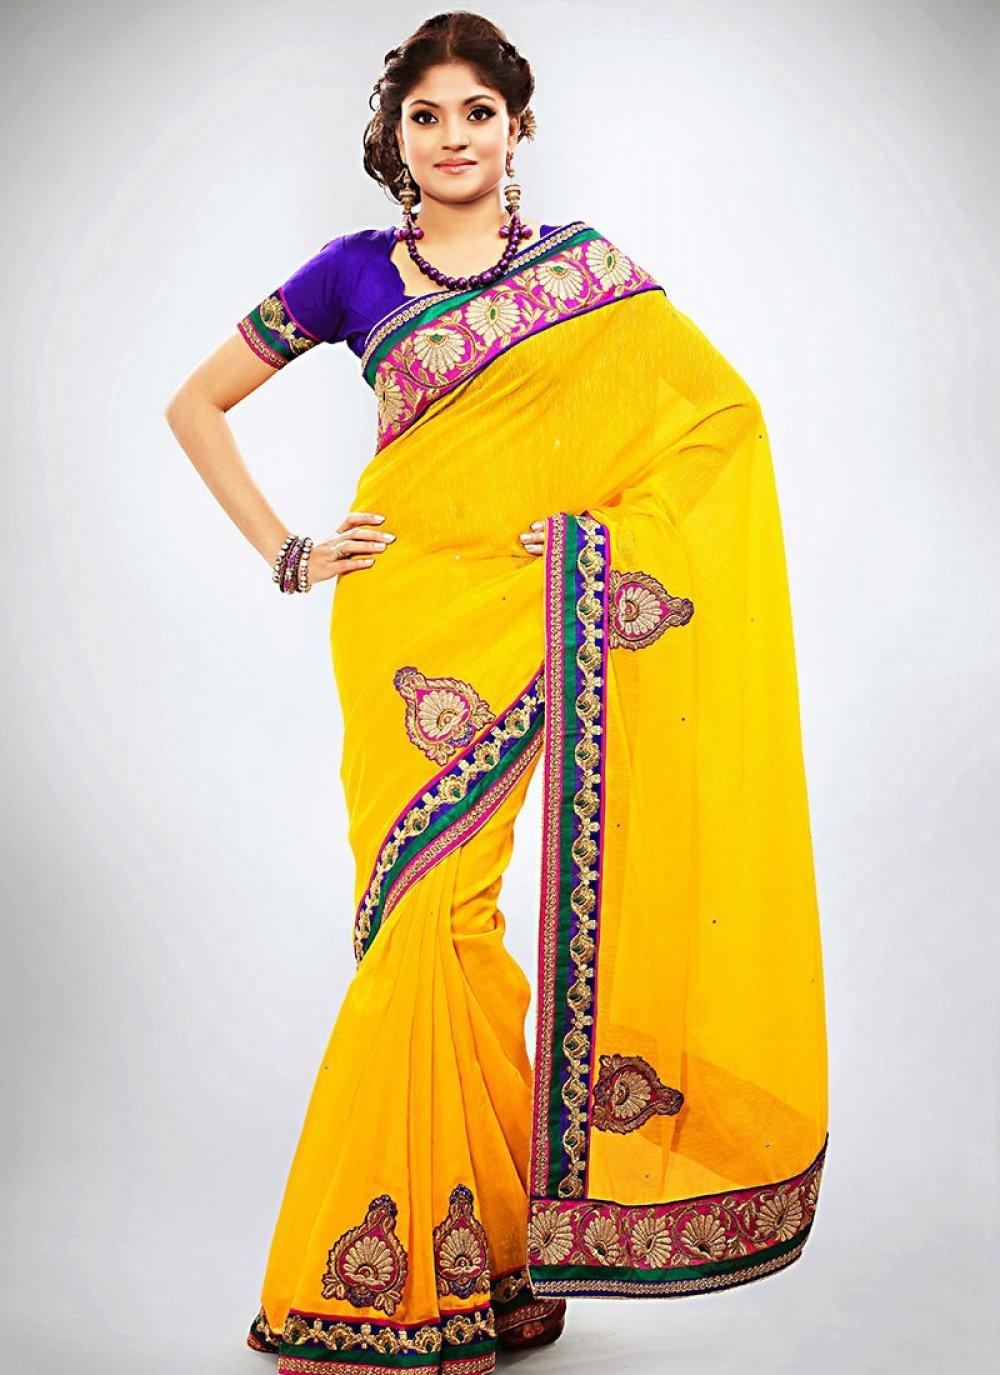 Exclusively Yellow Jute Wedding Saree